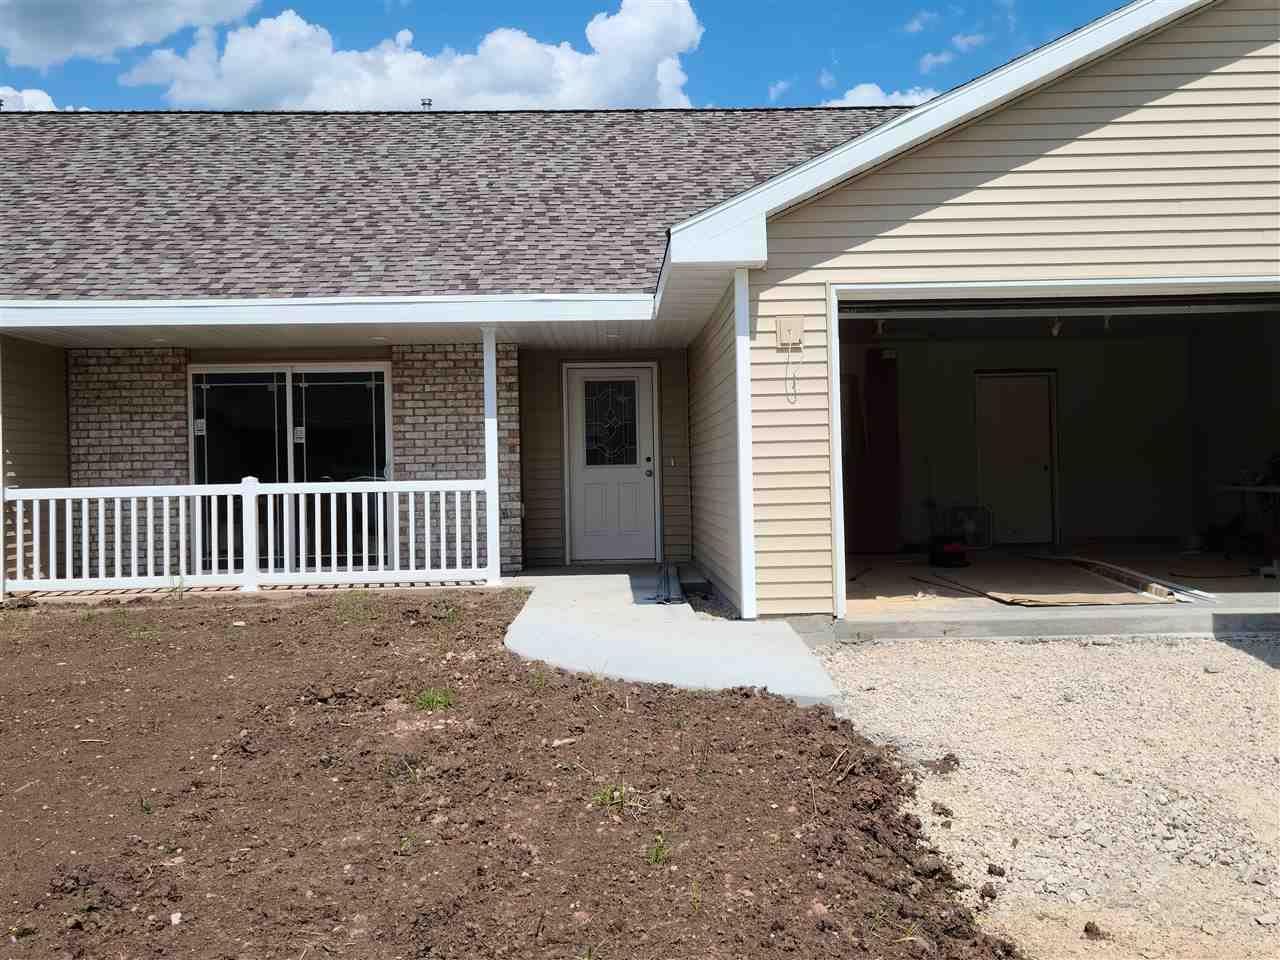 119 STONE CASTLE Drive, Fond du Lac, WI 54935 - MLS#: 50235178